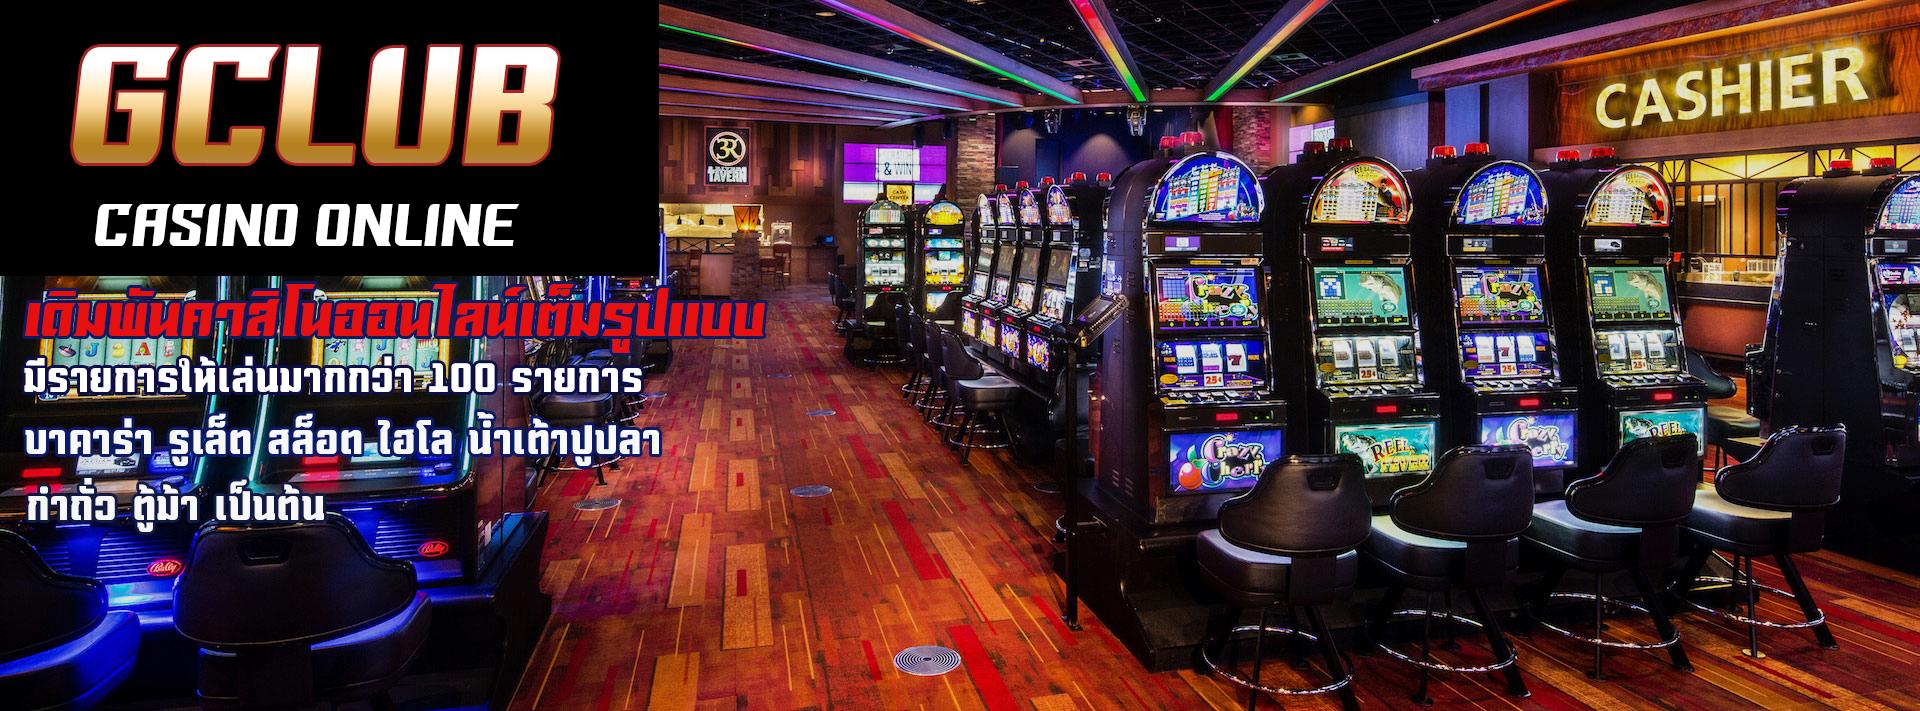 wall-casino